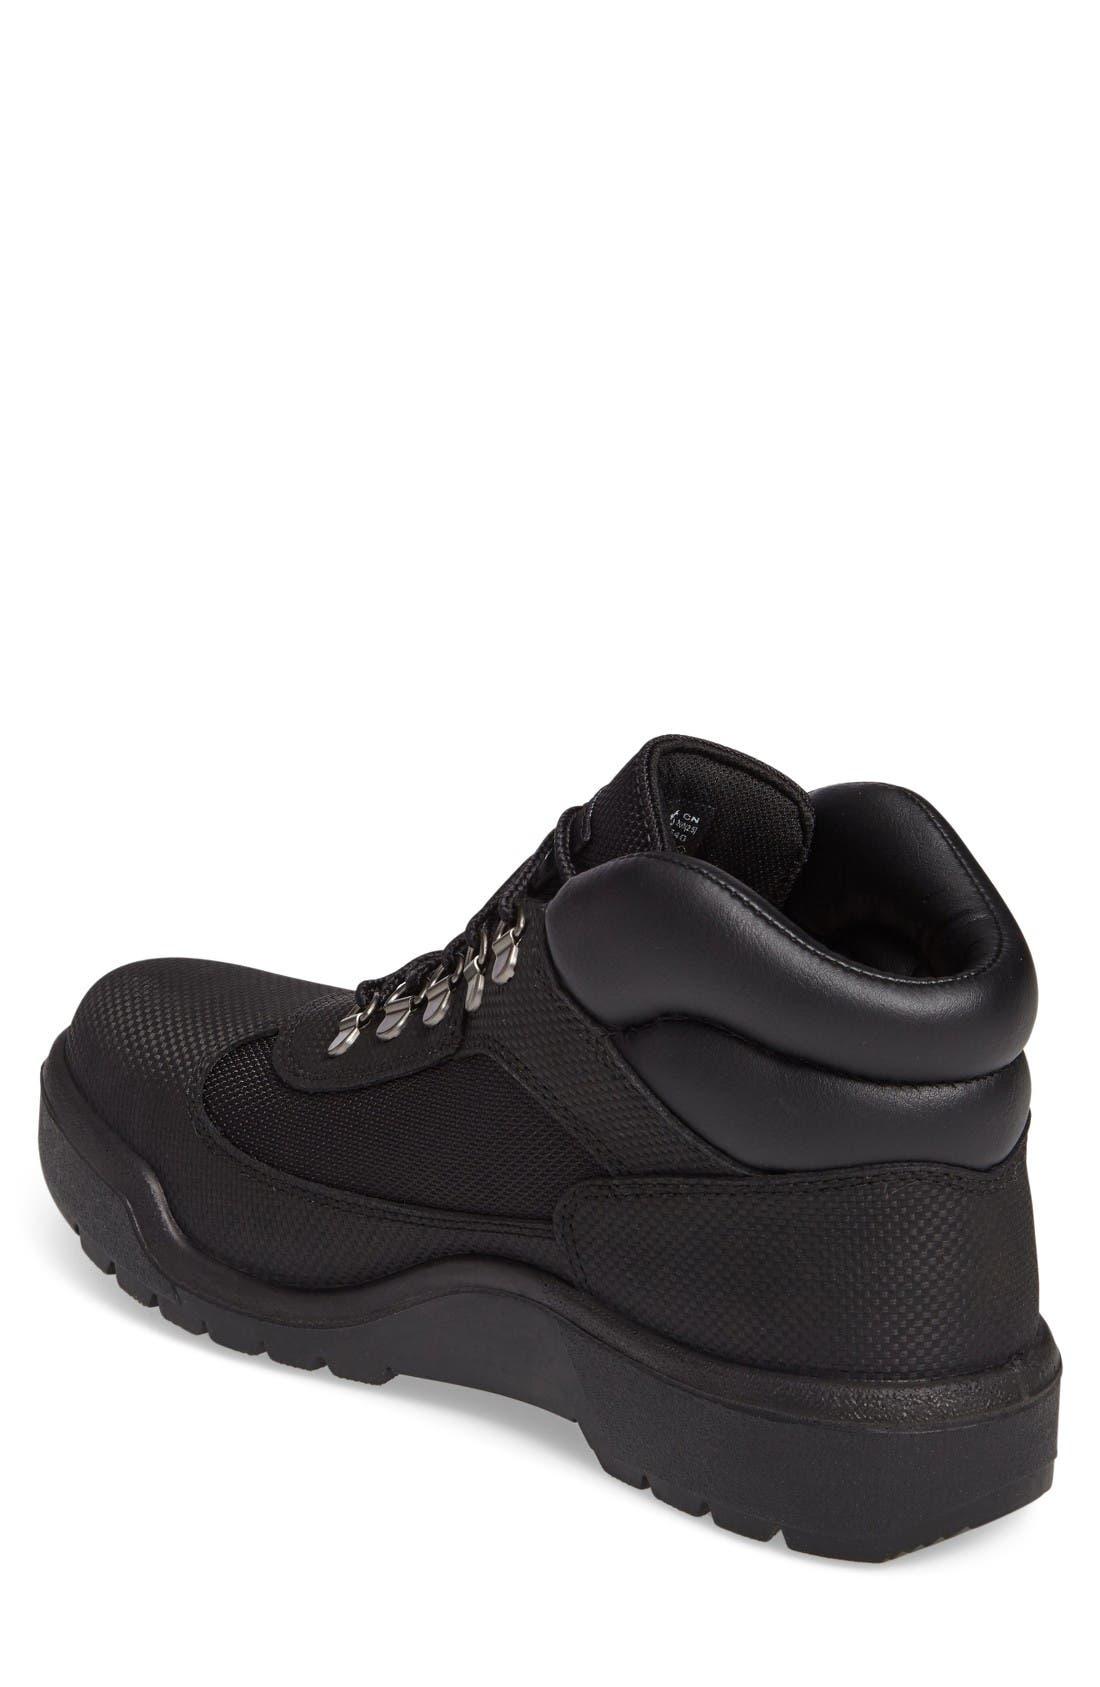 Alternate Image 2  - Timberland Field Waterproof Hiking Boot (Men)